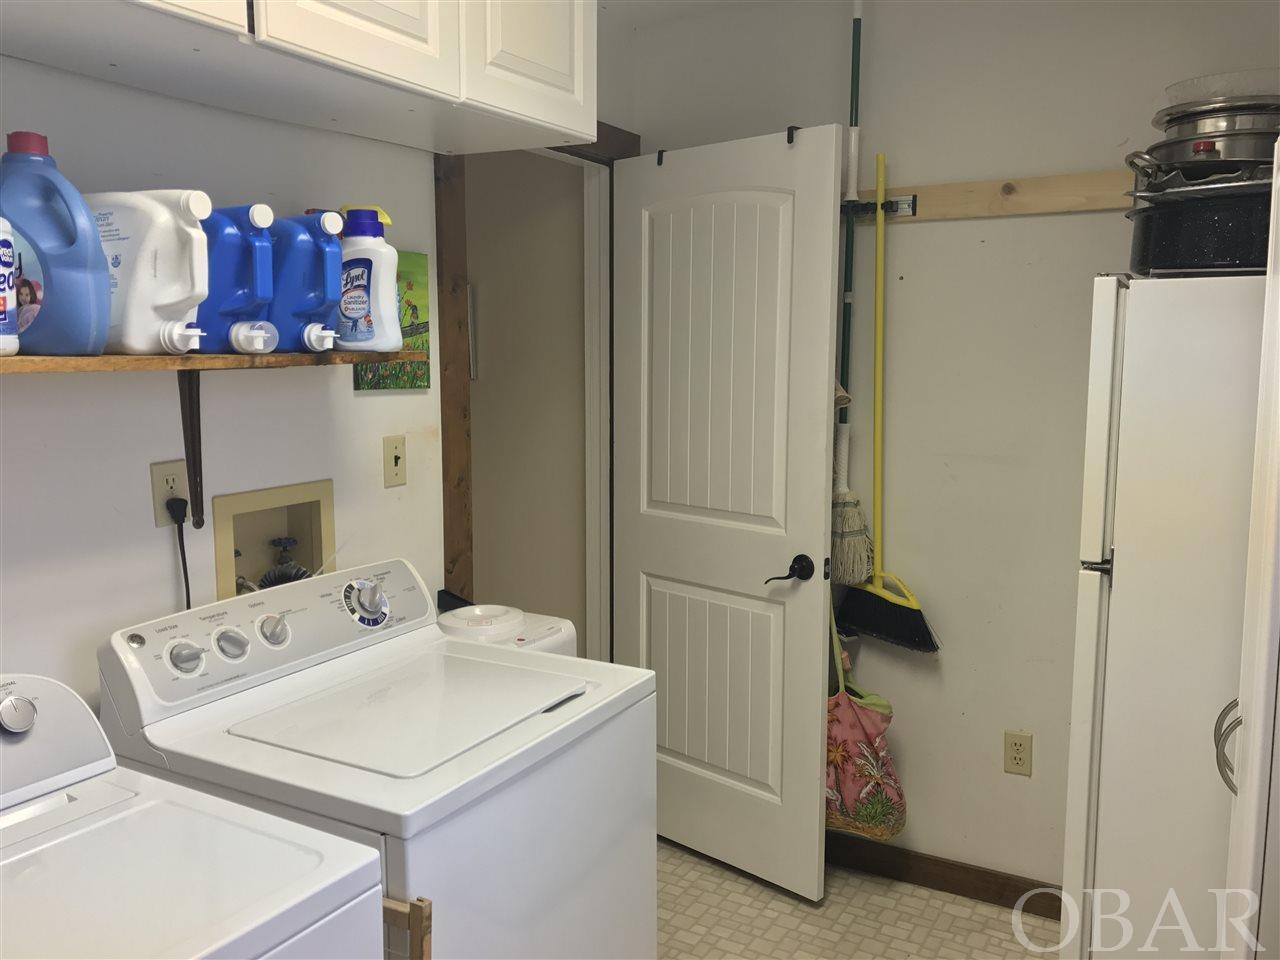 4305 Hesperides Drive,Nags Head,NC 27959,4 Bedrooms Bedrooms,3 BathroomsBathrooms,Residential,Hesperides Drive,97299